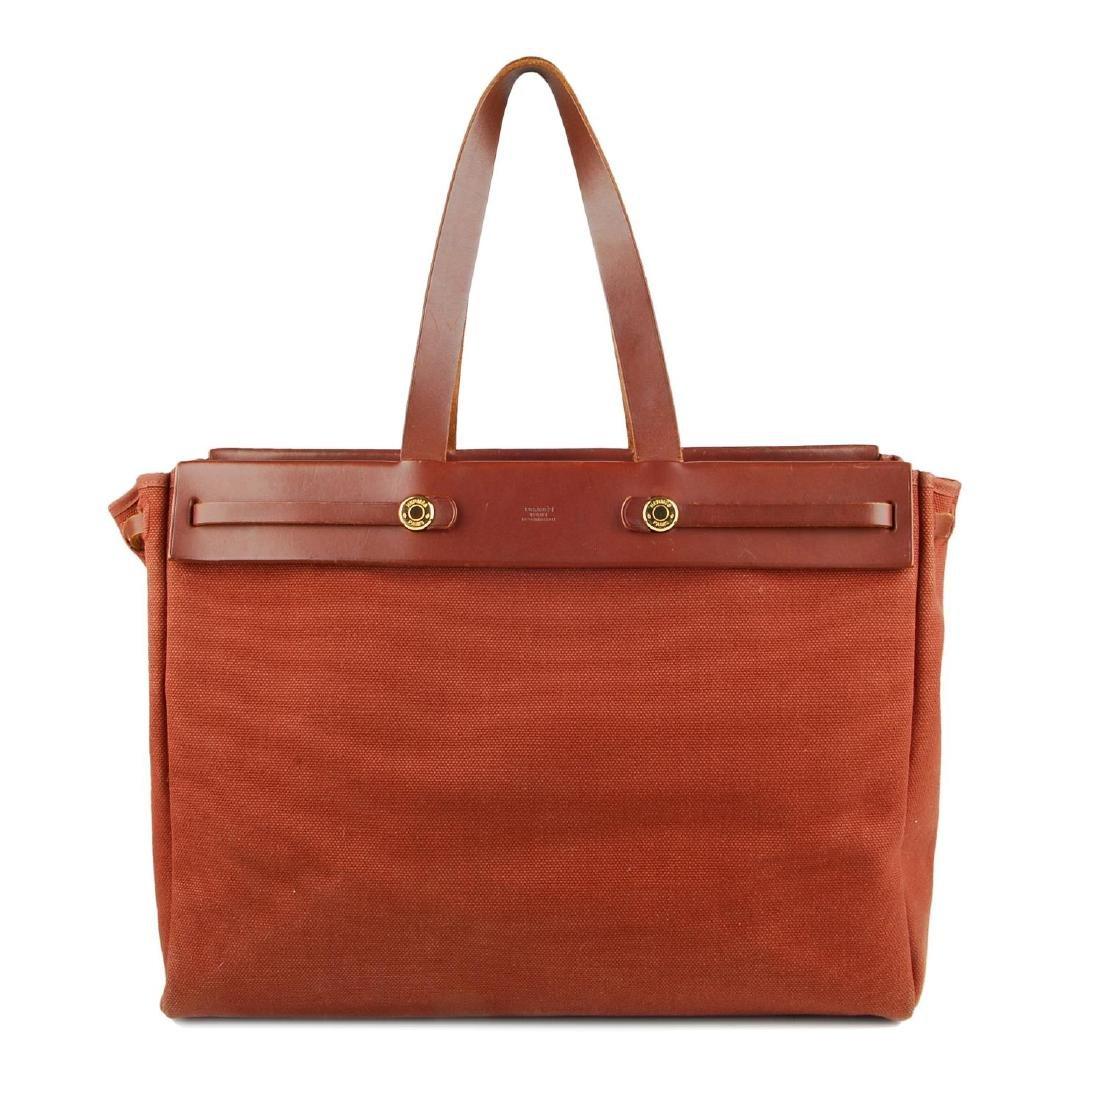 HERMÈS - a toile 2-in-1 Herbag Cabas MM handbag. A